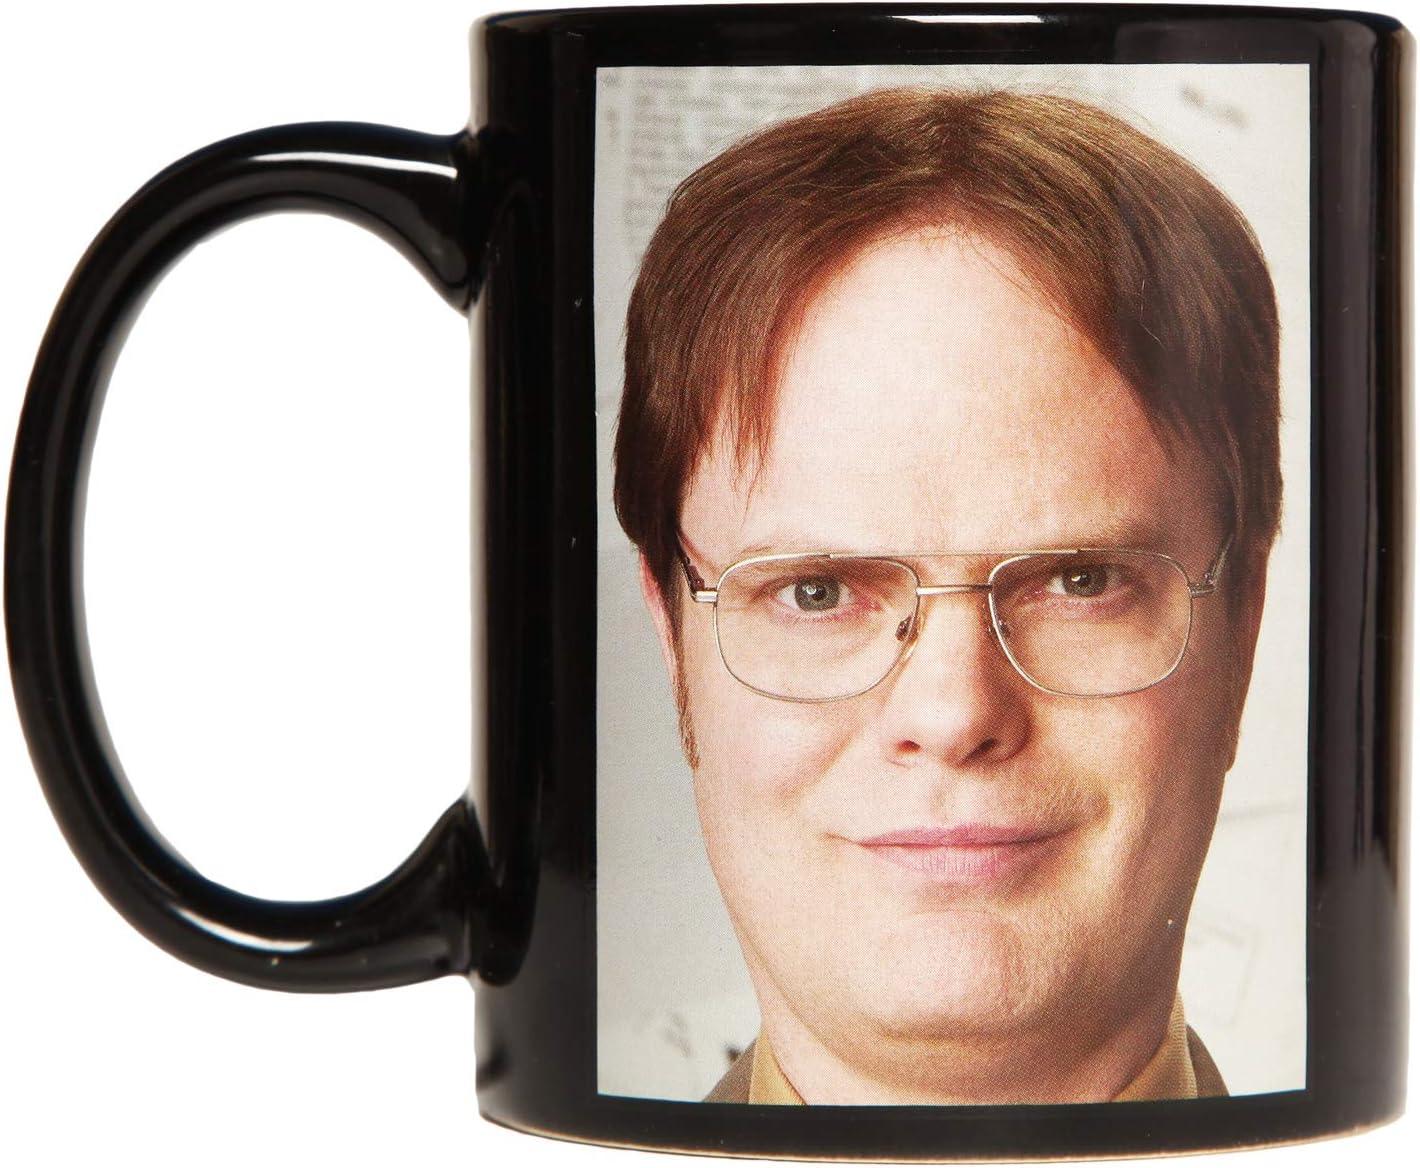 The Office Dwight Acronym 12 oz. Heat Change Ceramic Mug